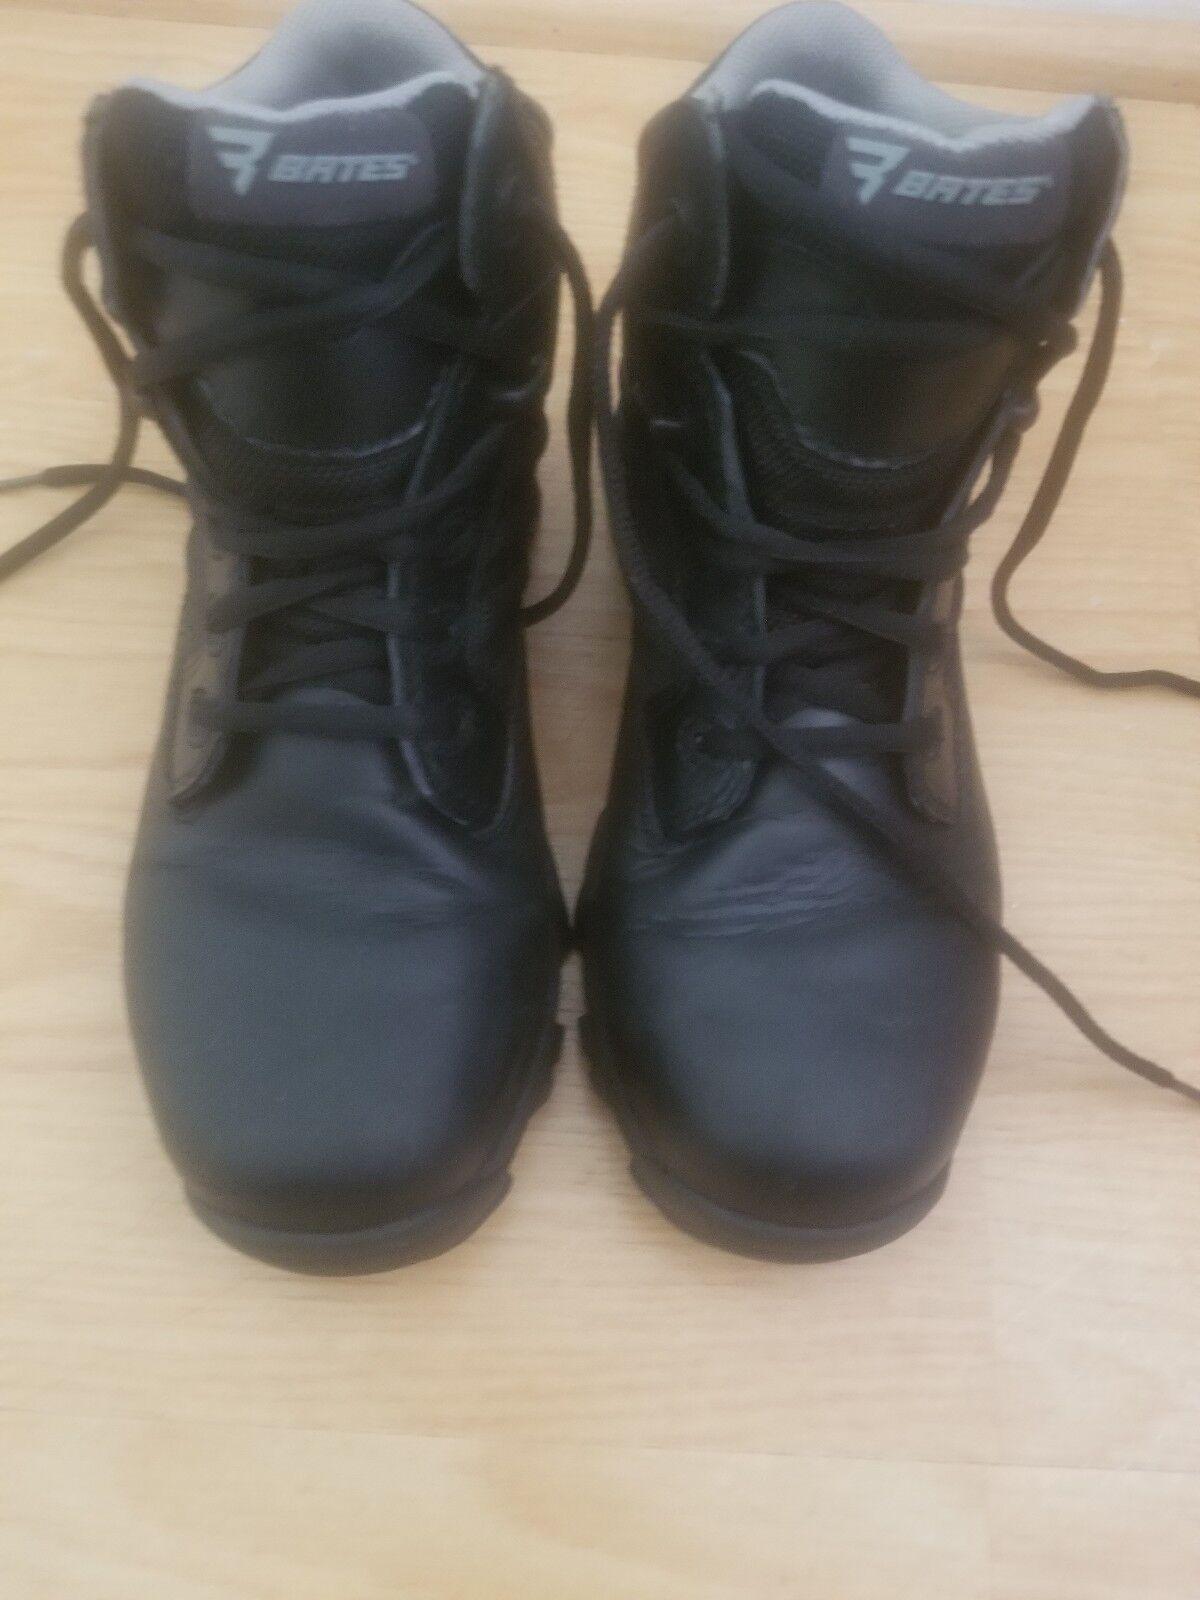 BATES Women Boots EO2766 Heavy Duty boots SIZE US 6 Like Brand New